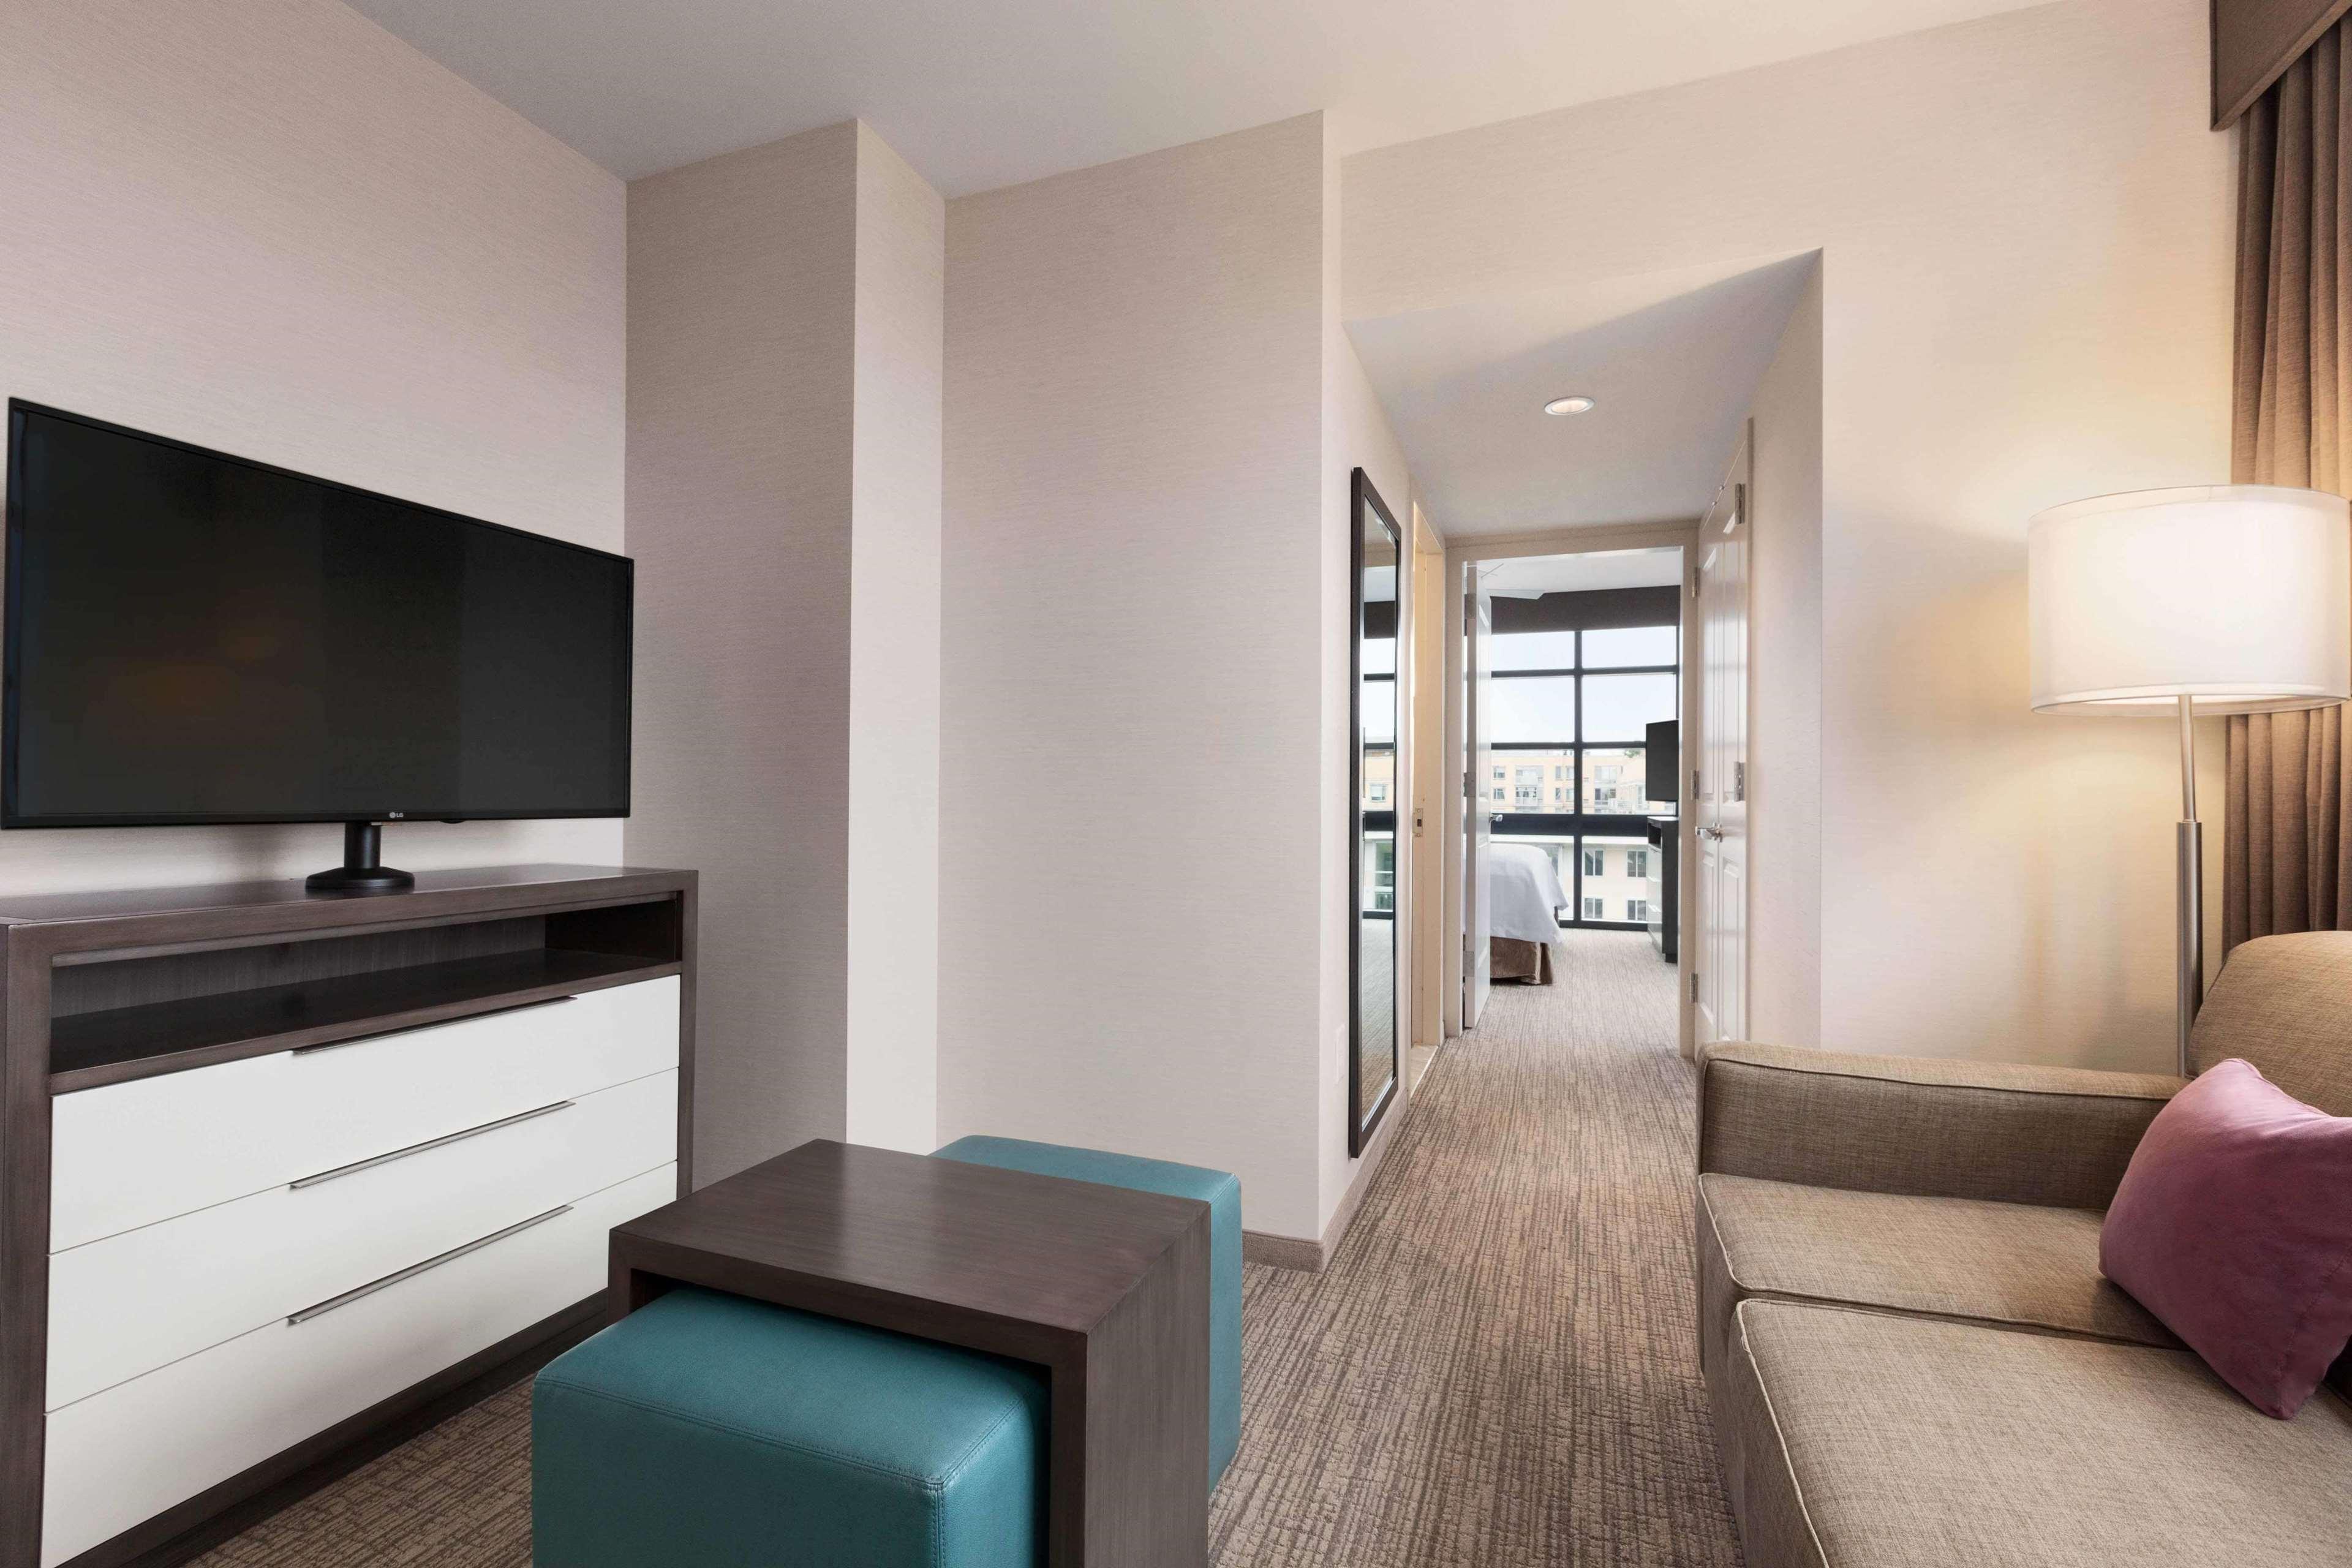 Homewood Suites by Hilton Washington DC Convention Center image 23